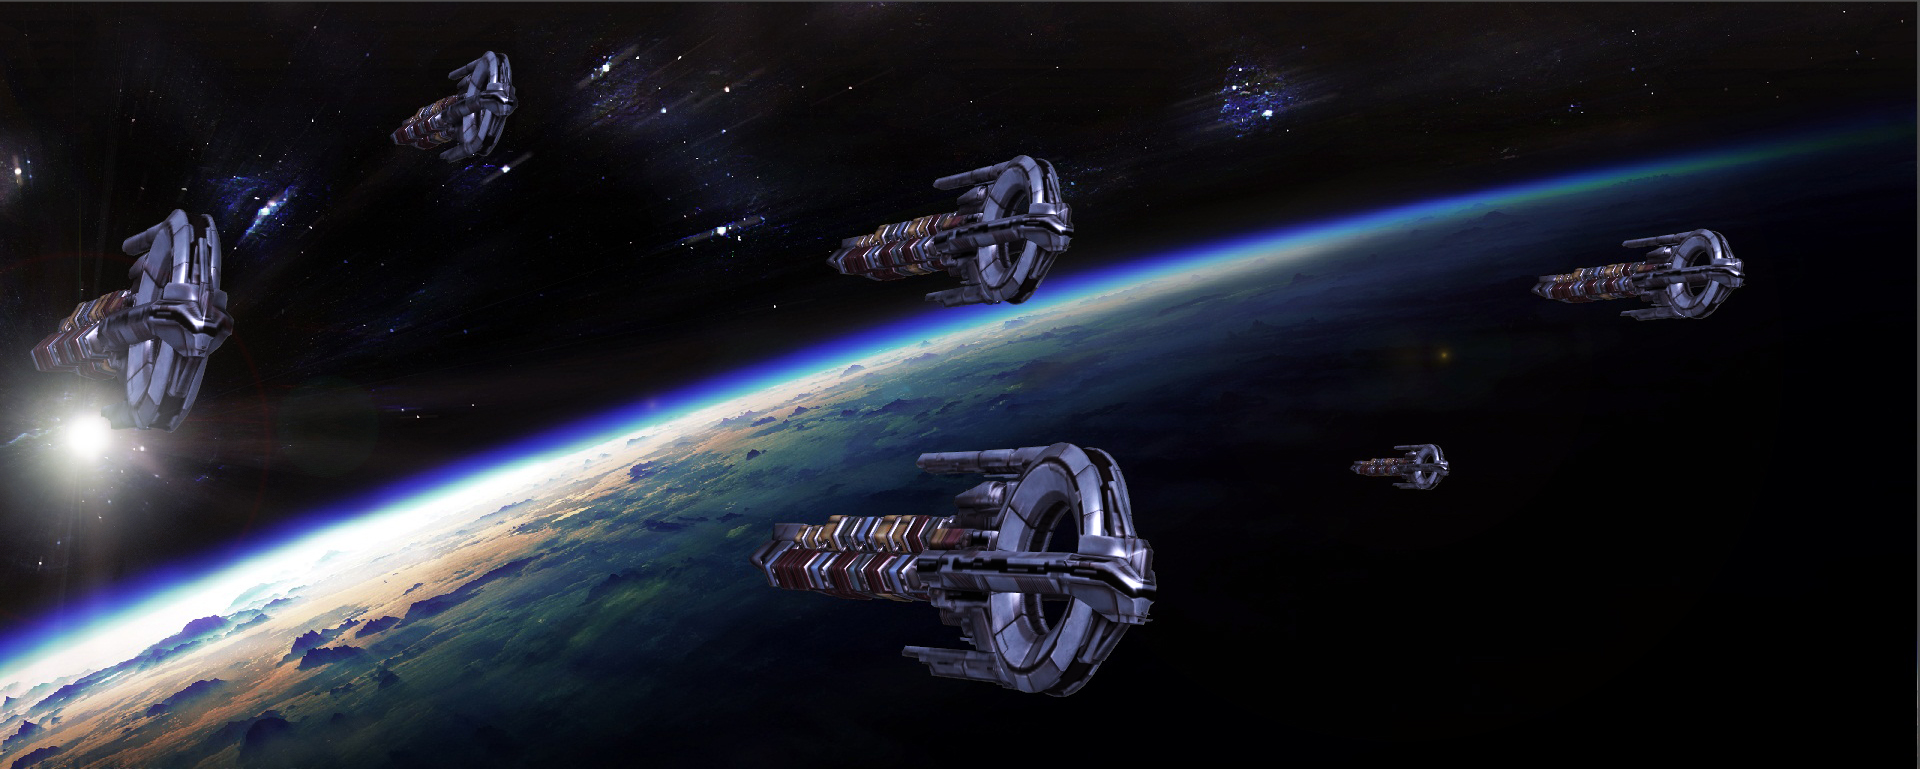 external image quarian_patrol_by_thekillercobra-d5gihbw.jpg